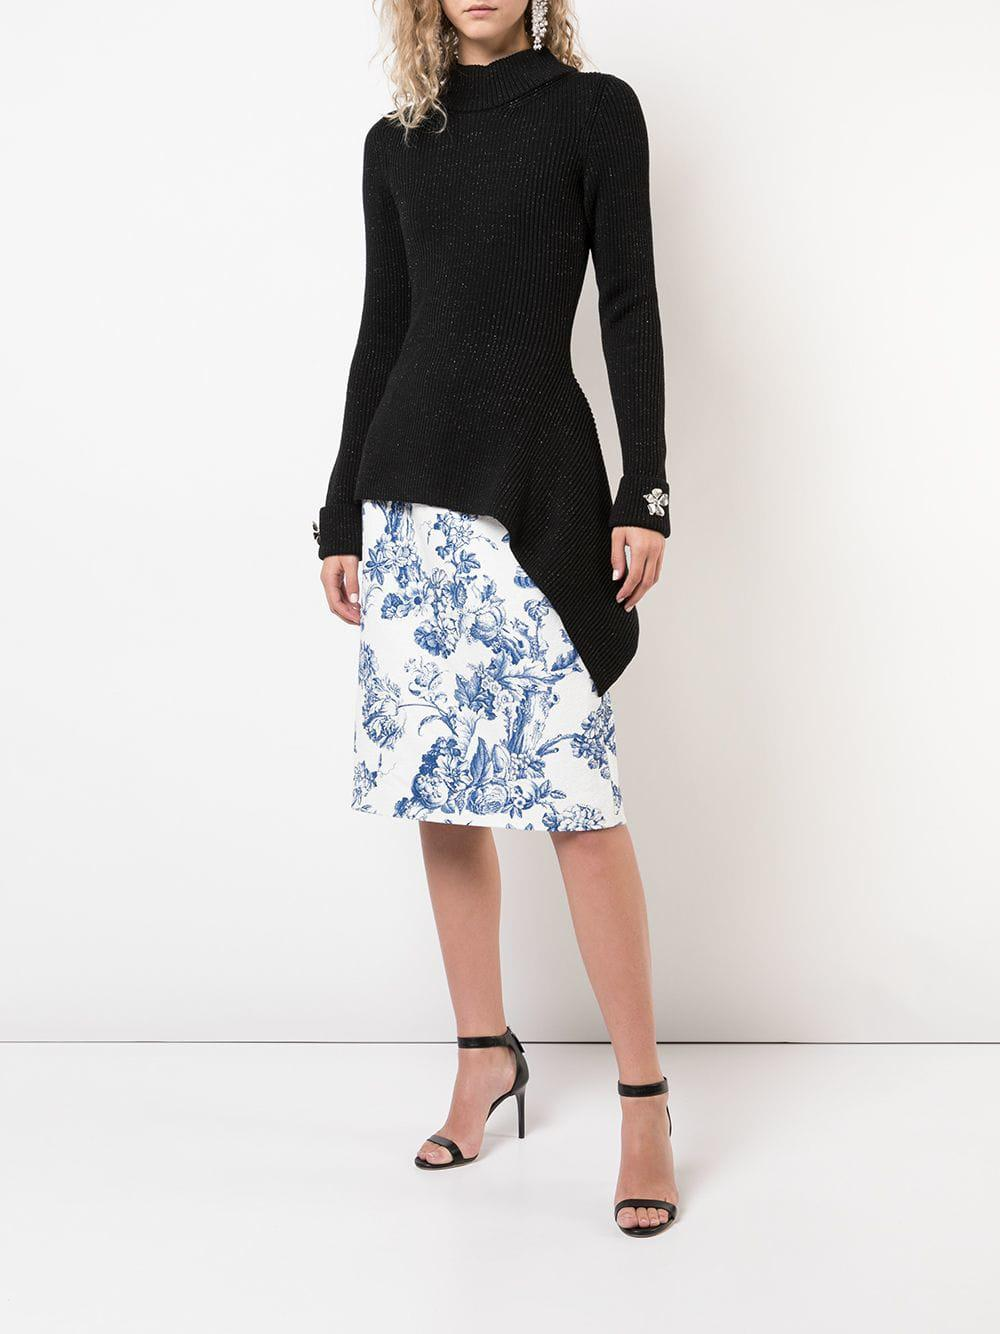 2c2f83dc6f0 Lyst - Oscar de la Renta Floral Print Midi Skirt in White